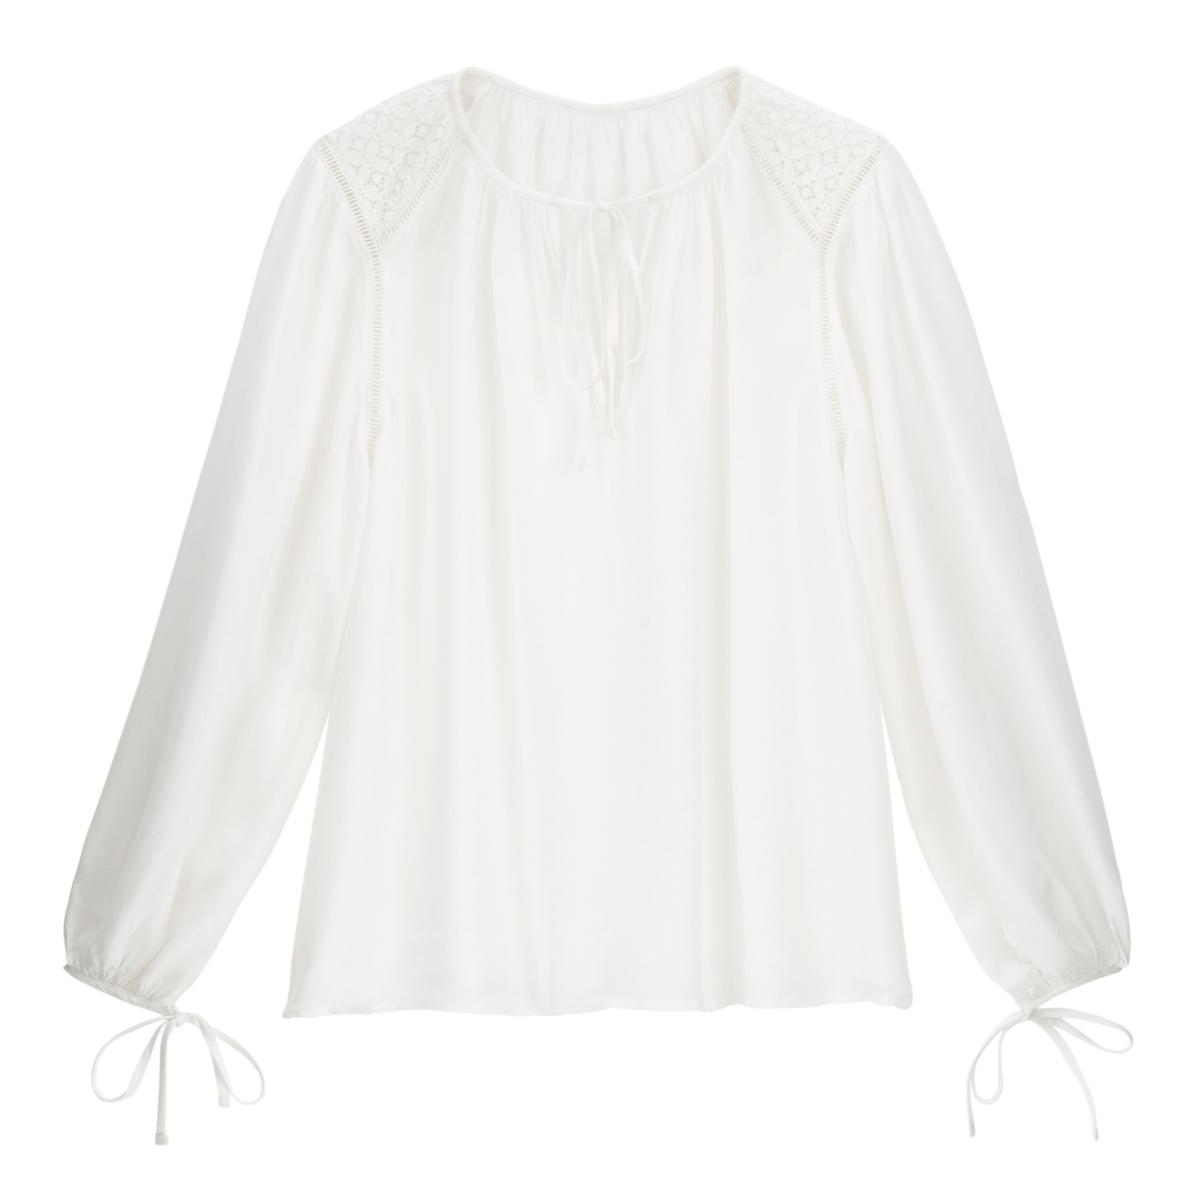 Blusa con cuello redondo y manga larga ablusada